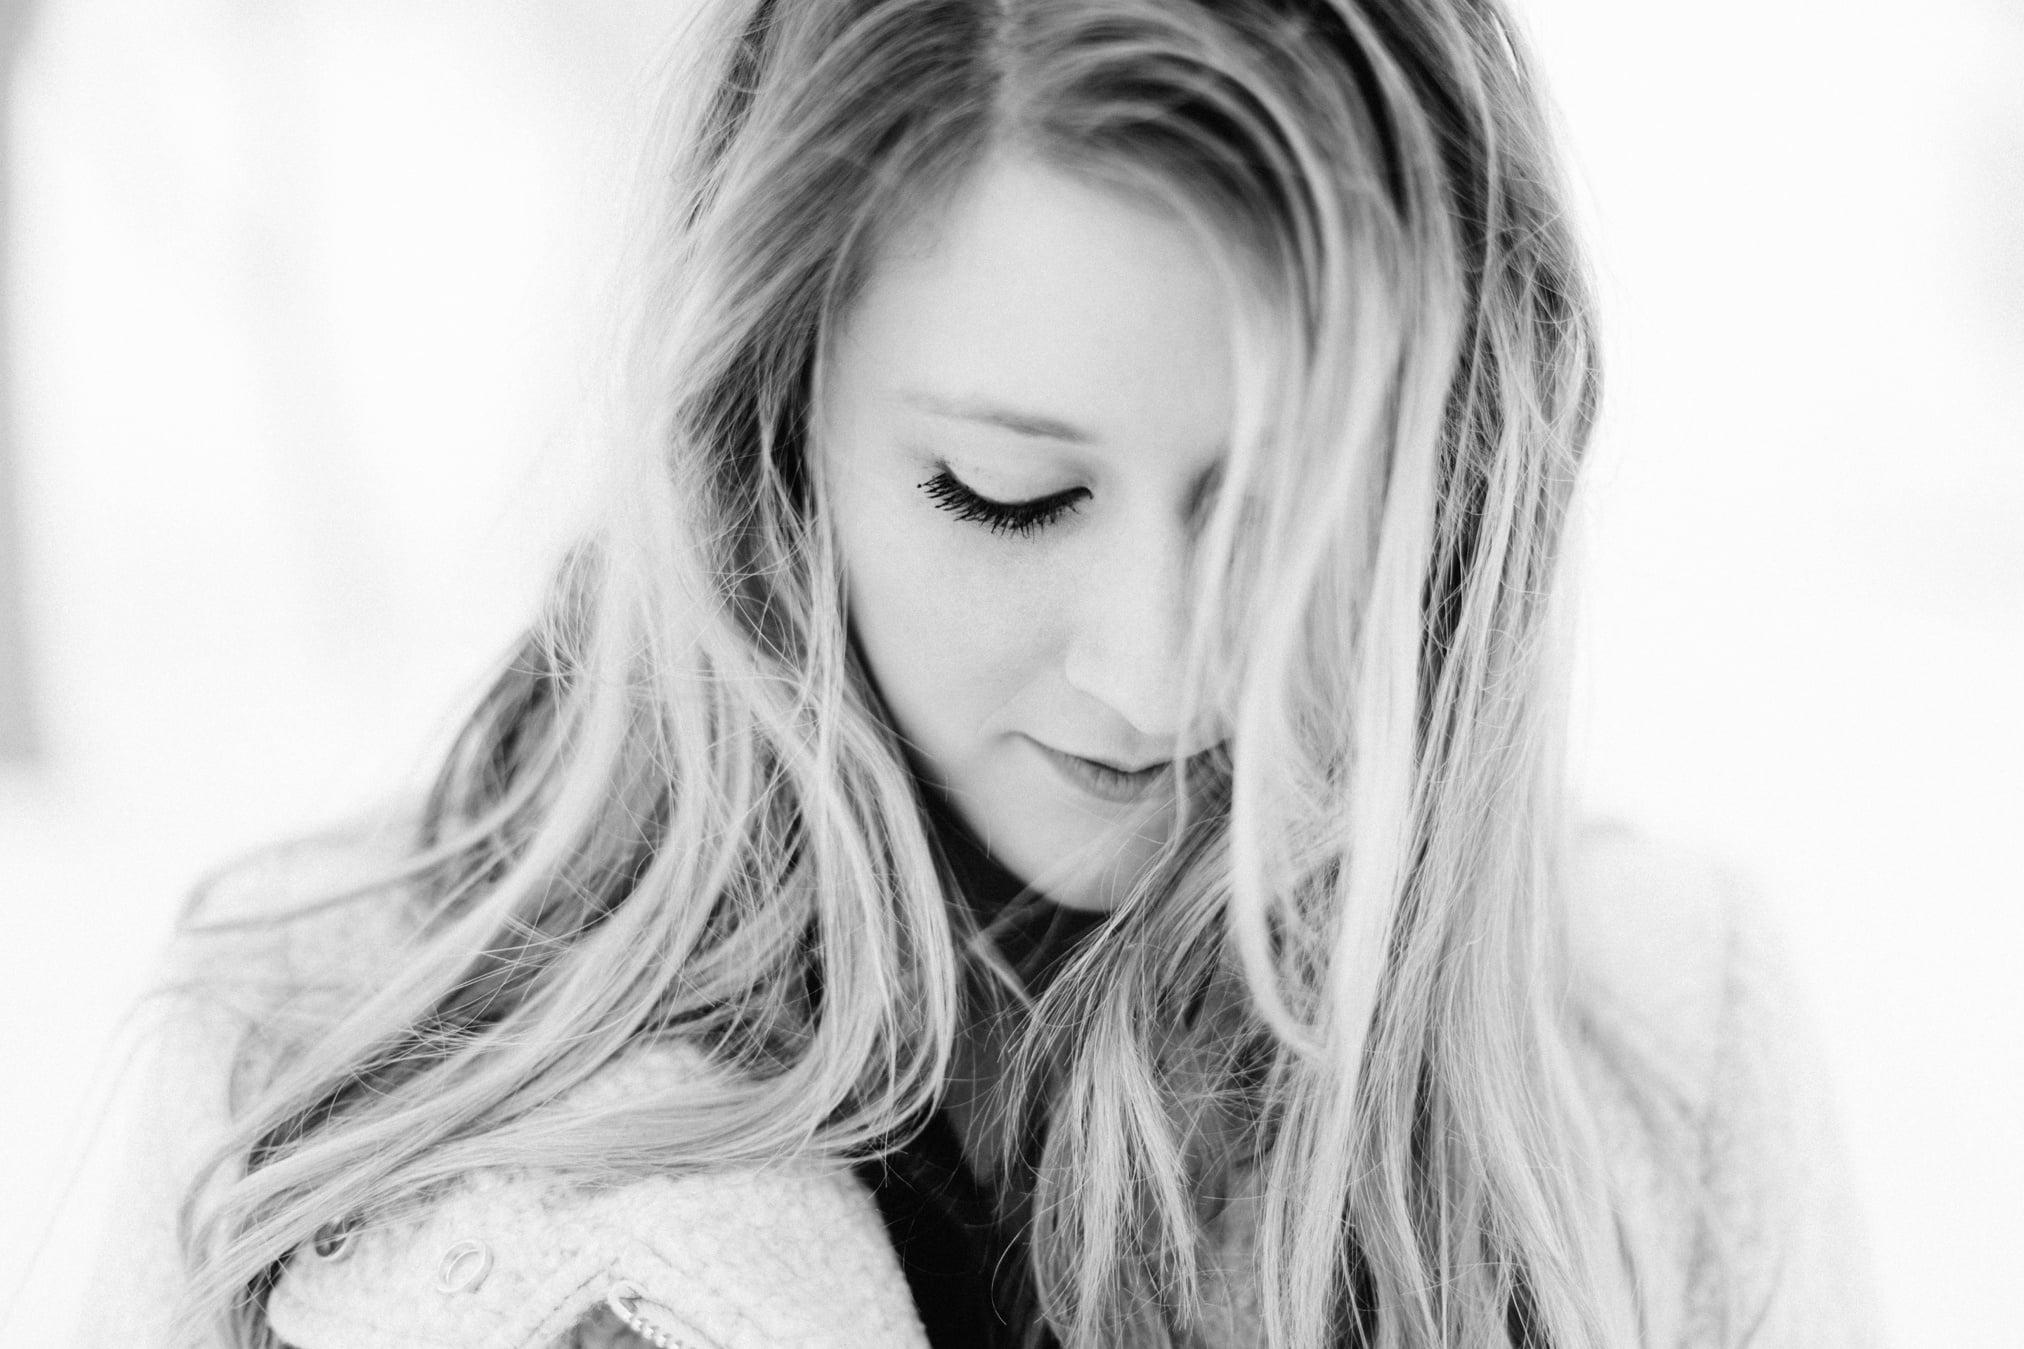 Elena_LovelyWinterShoot-39.jpg